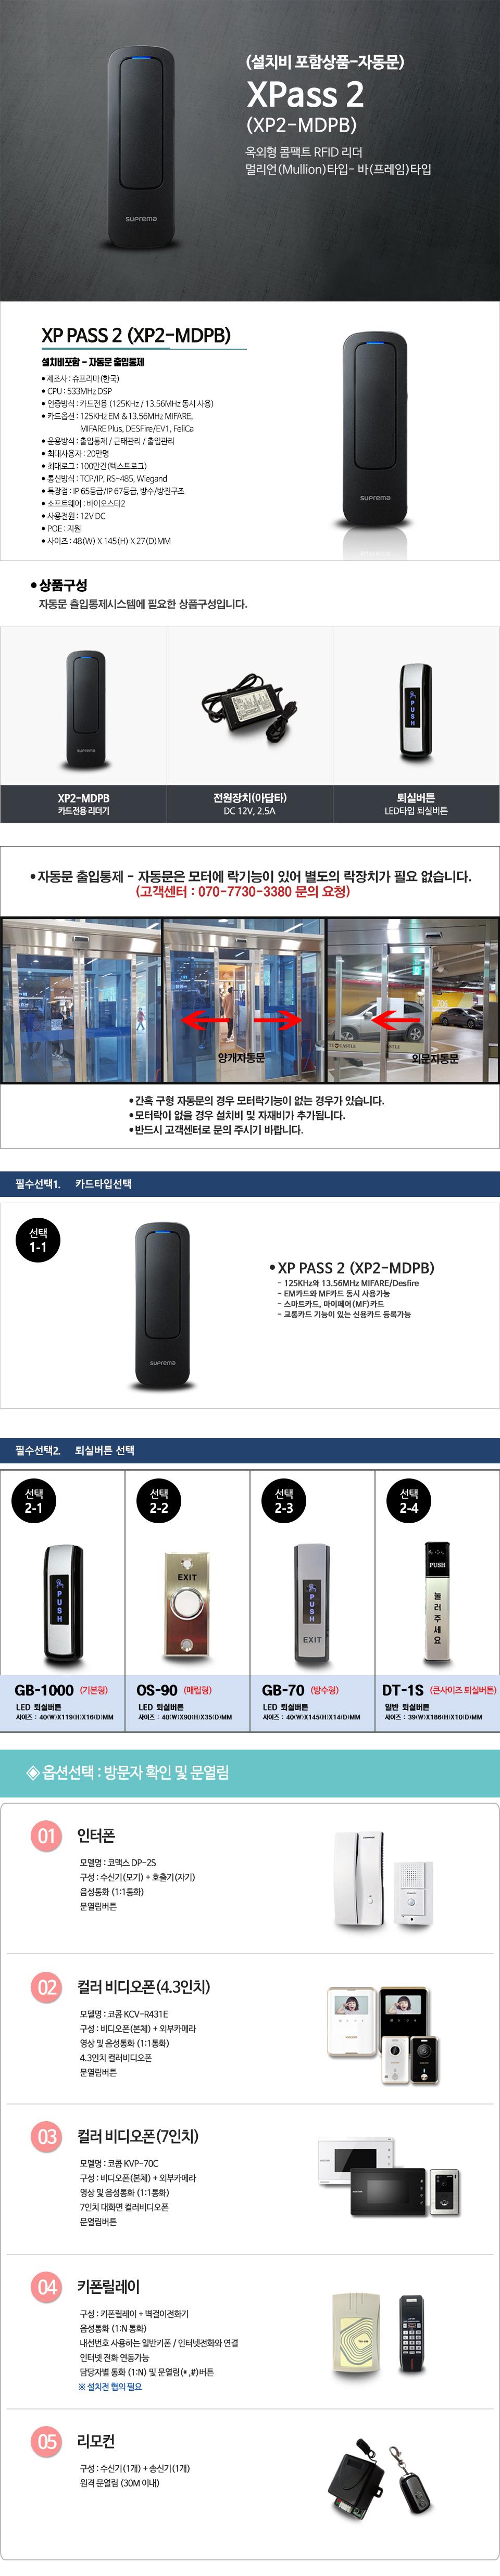 XP2-MDPB설치비포함작업-자동문.jpg